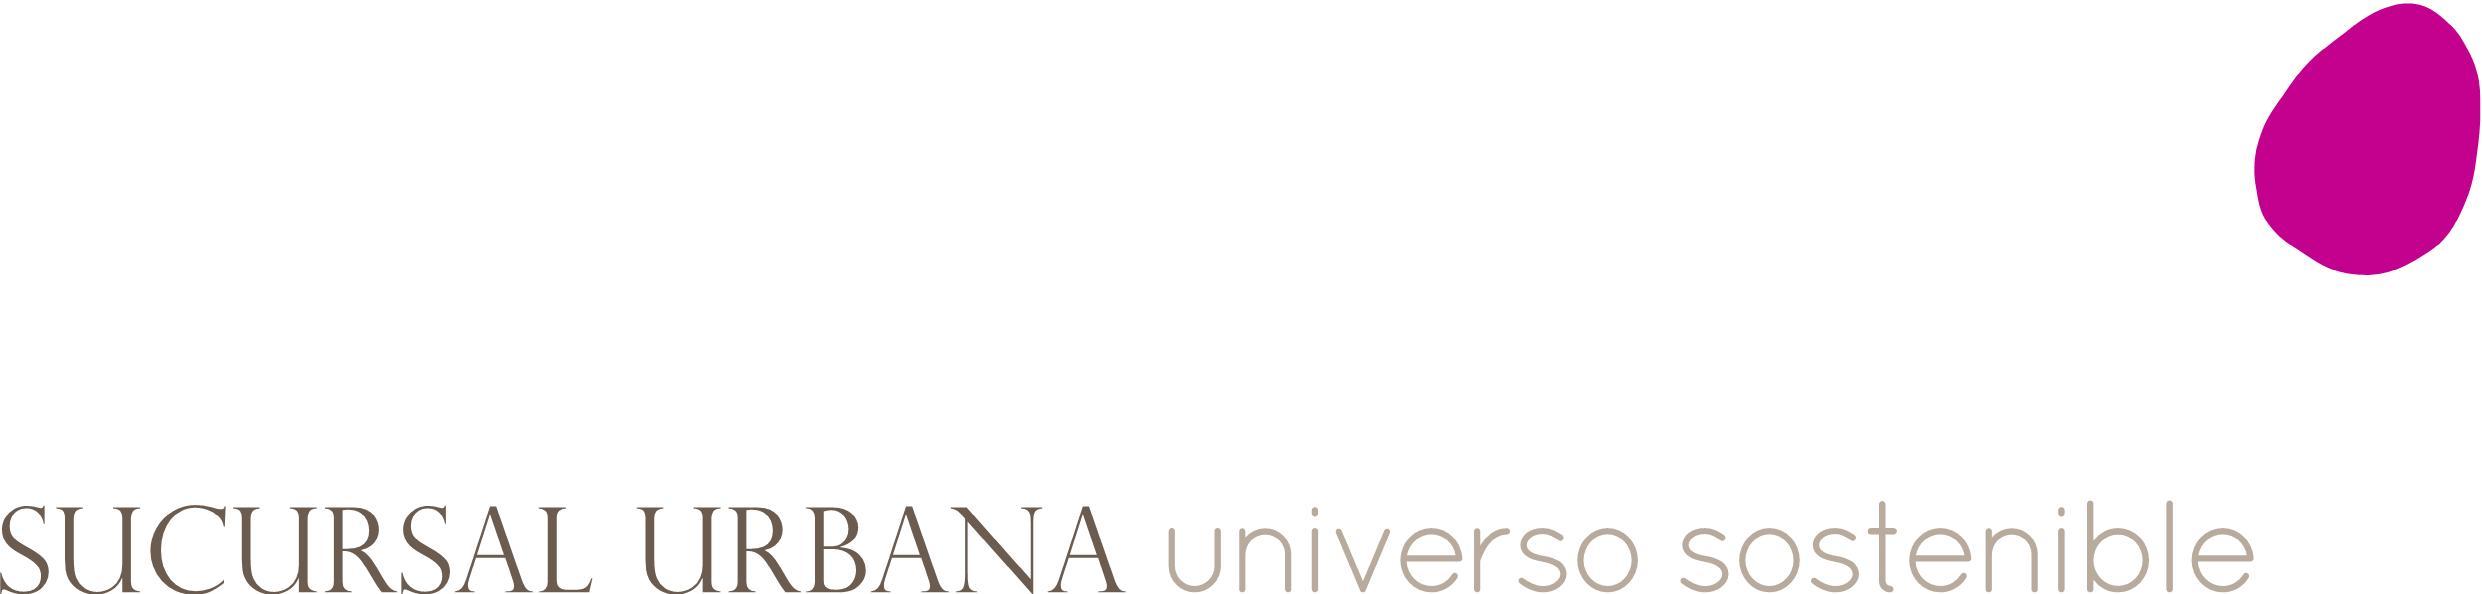 Logo Sucursal Urbana Universo Sostenible, S.L. - SuuS